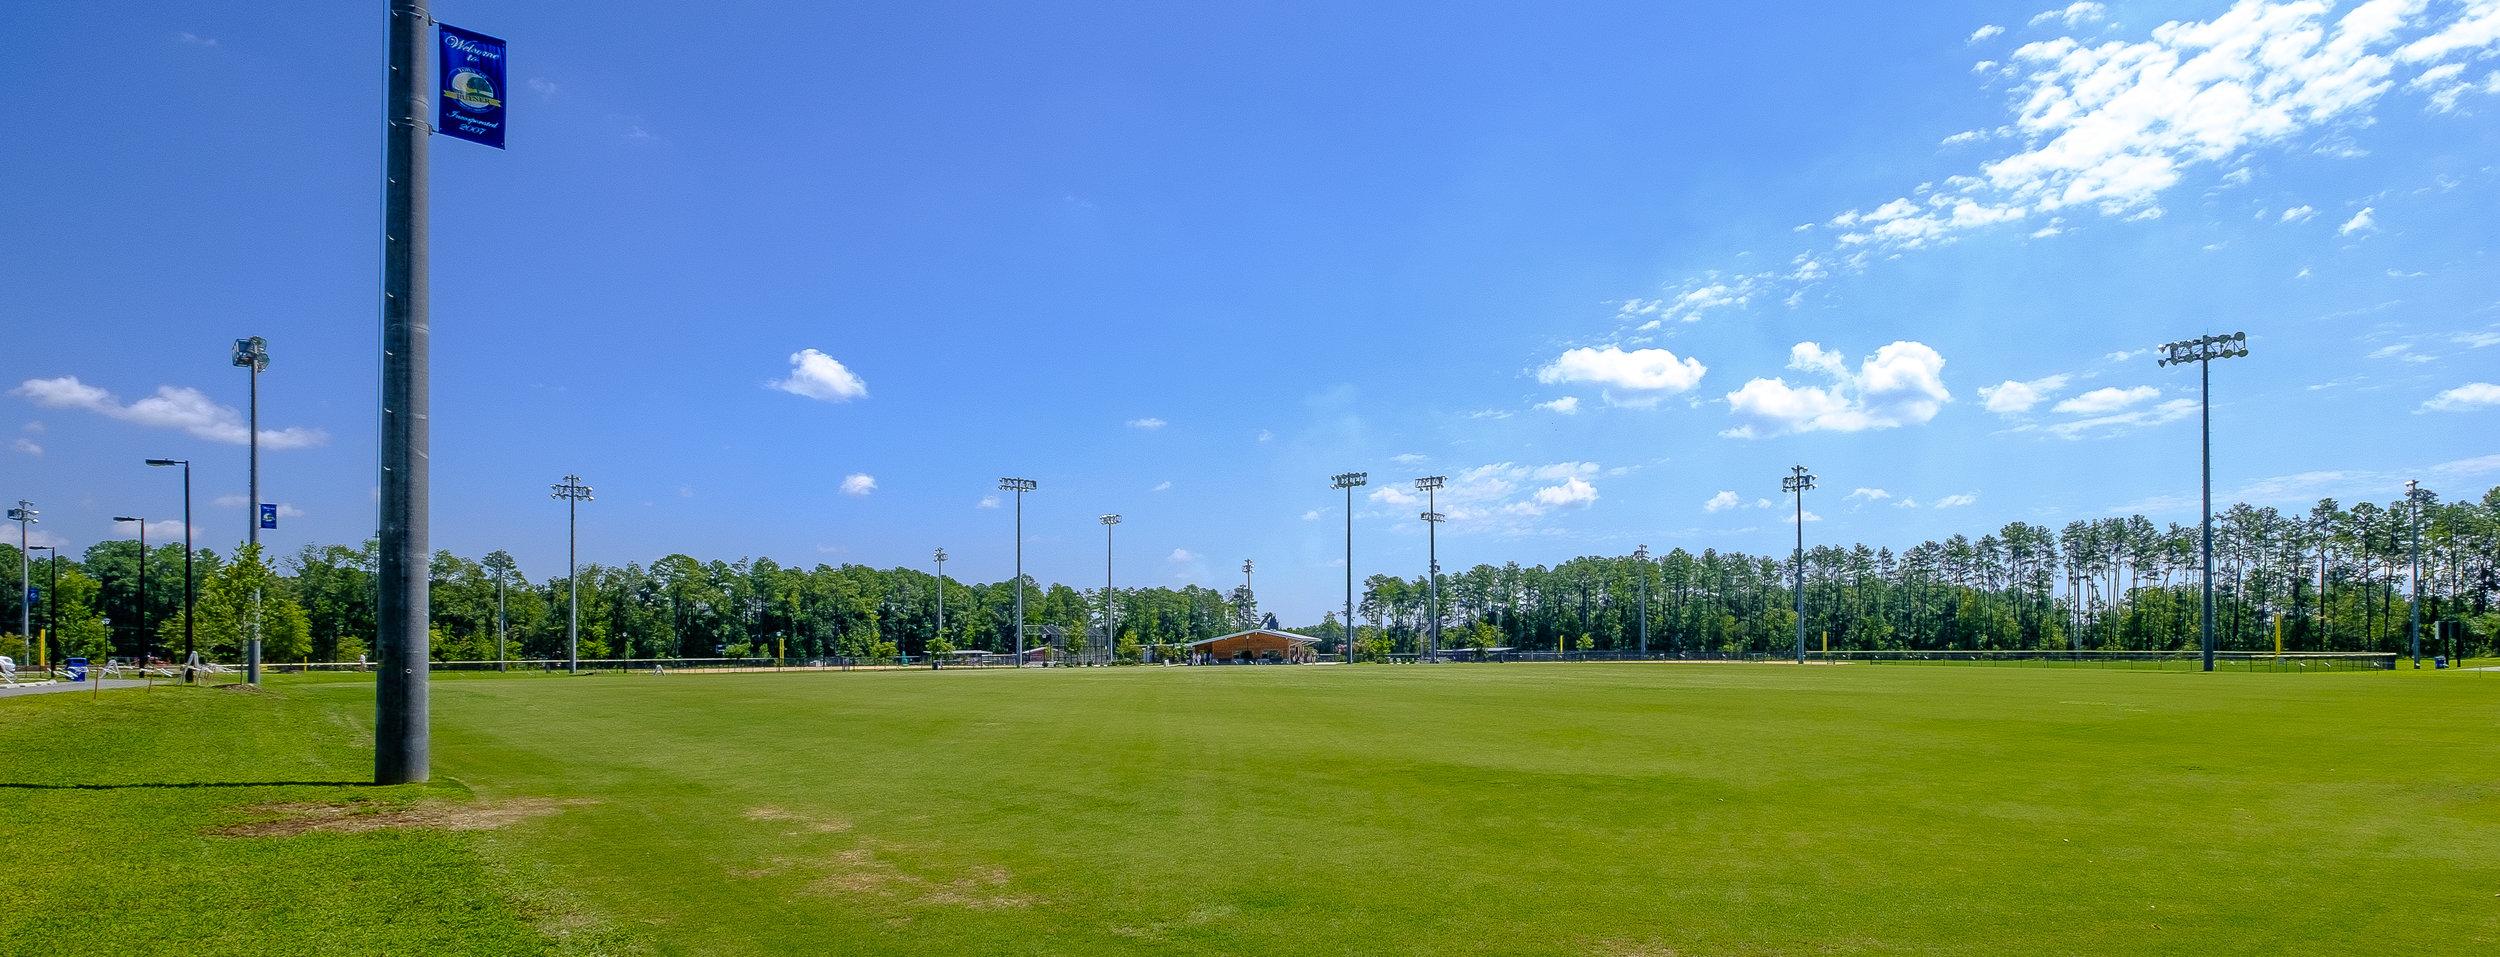 Butner Athletic Park-006.jpg